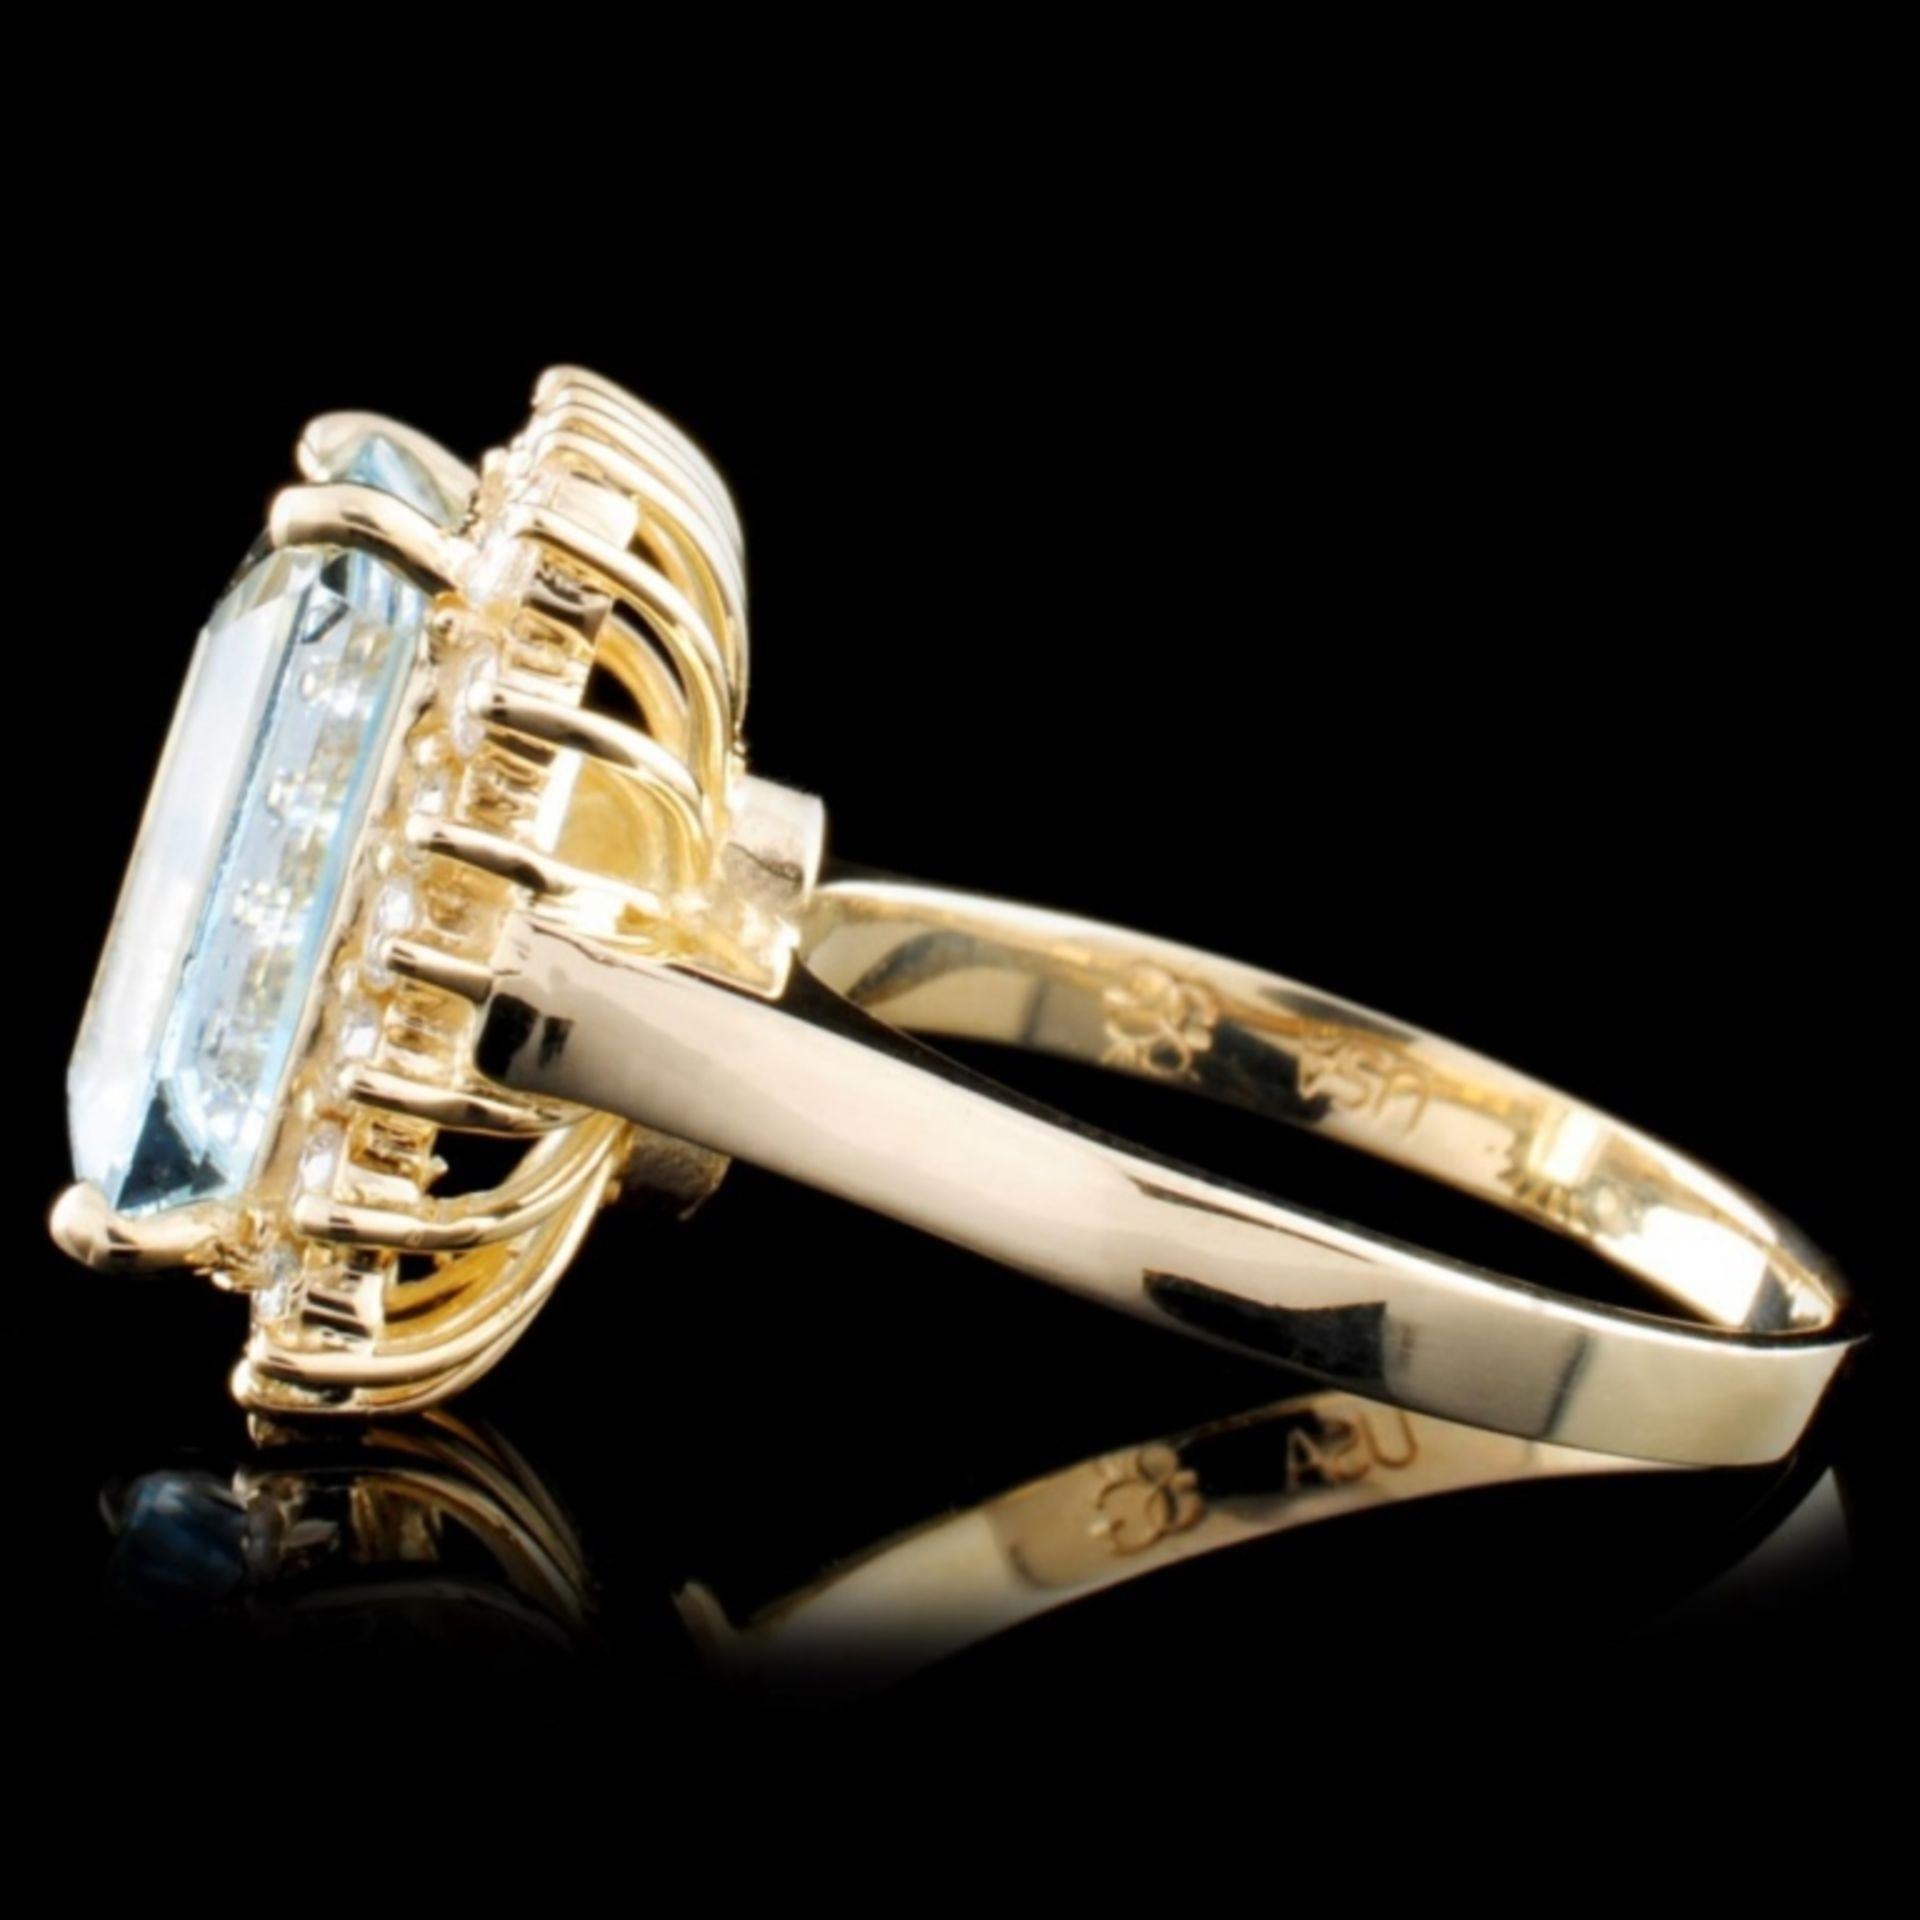 14K Gold 5.45ct Aquamarine & 0.52ctw Diamond Ring - Image 3 of 4